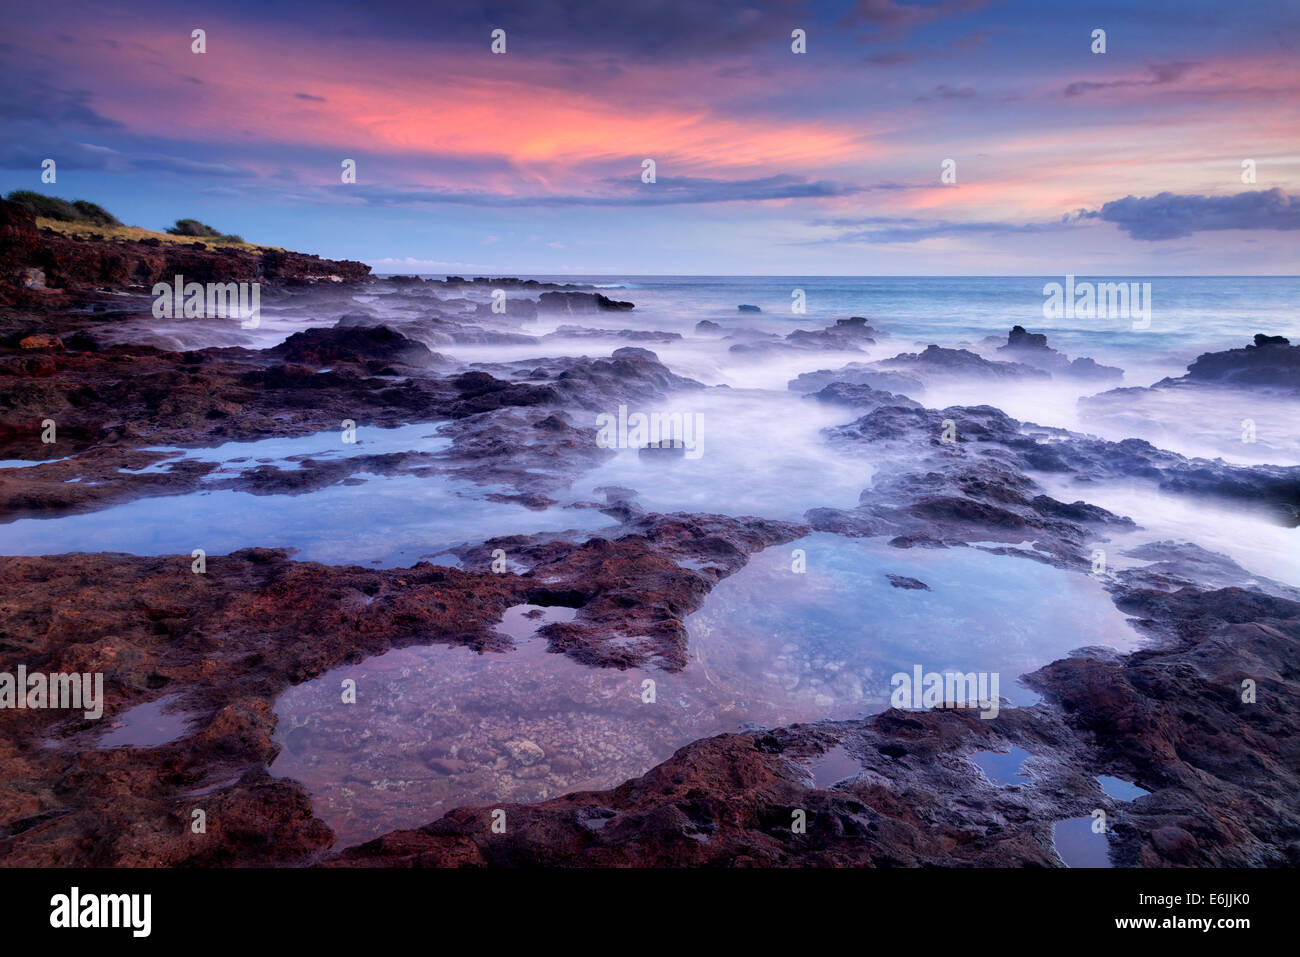 Sonnenuntergang und Tidepools. Lanai, Hawaii Stockbild